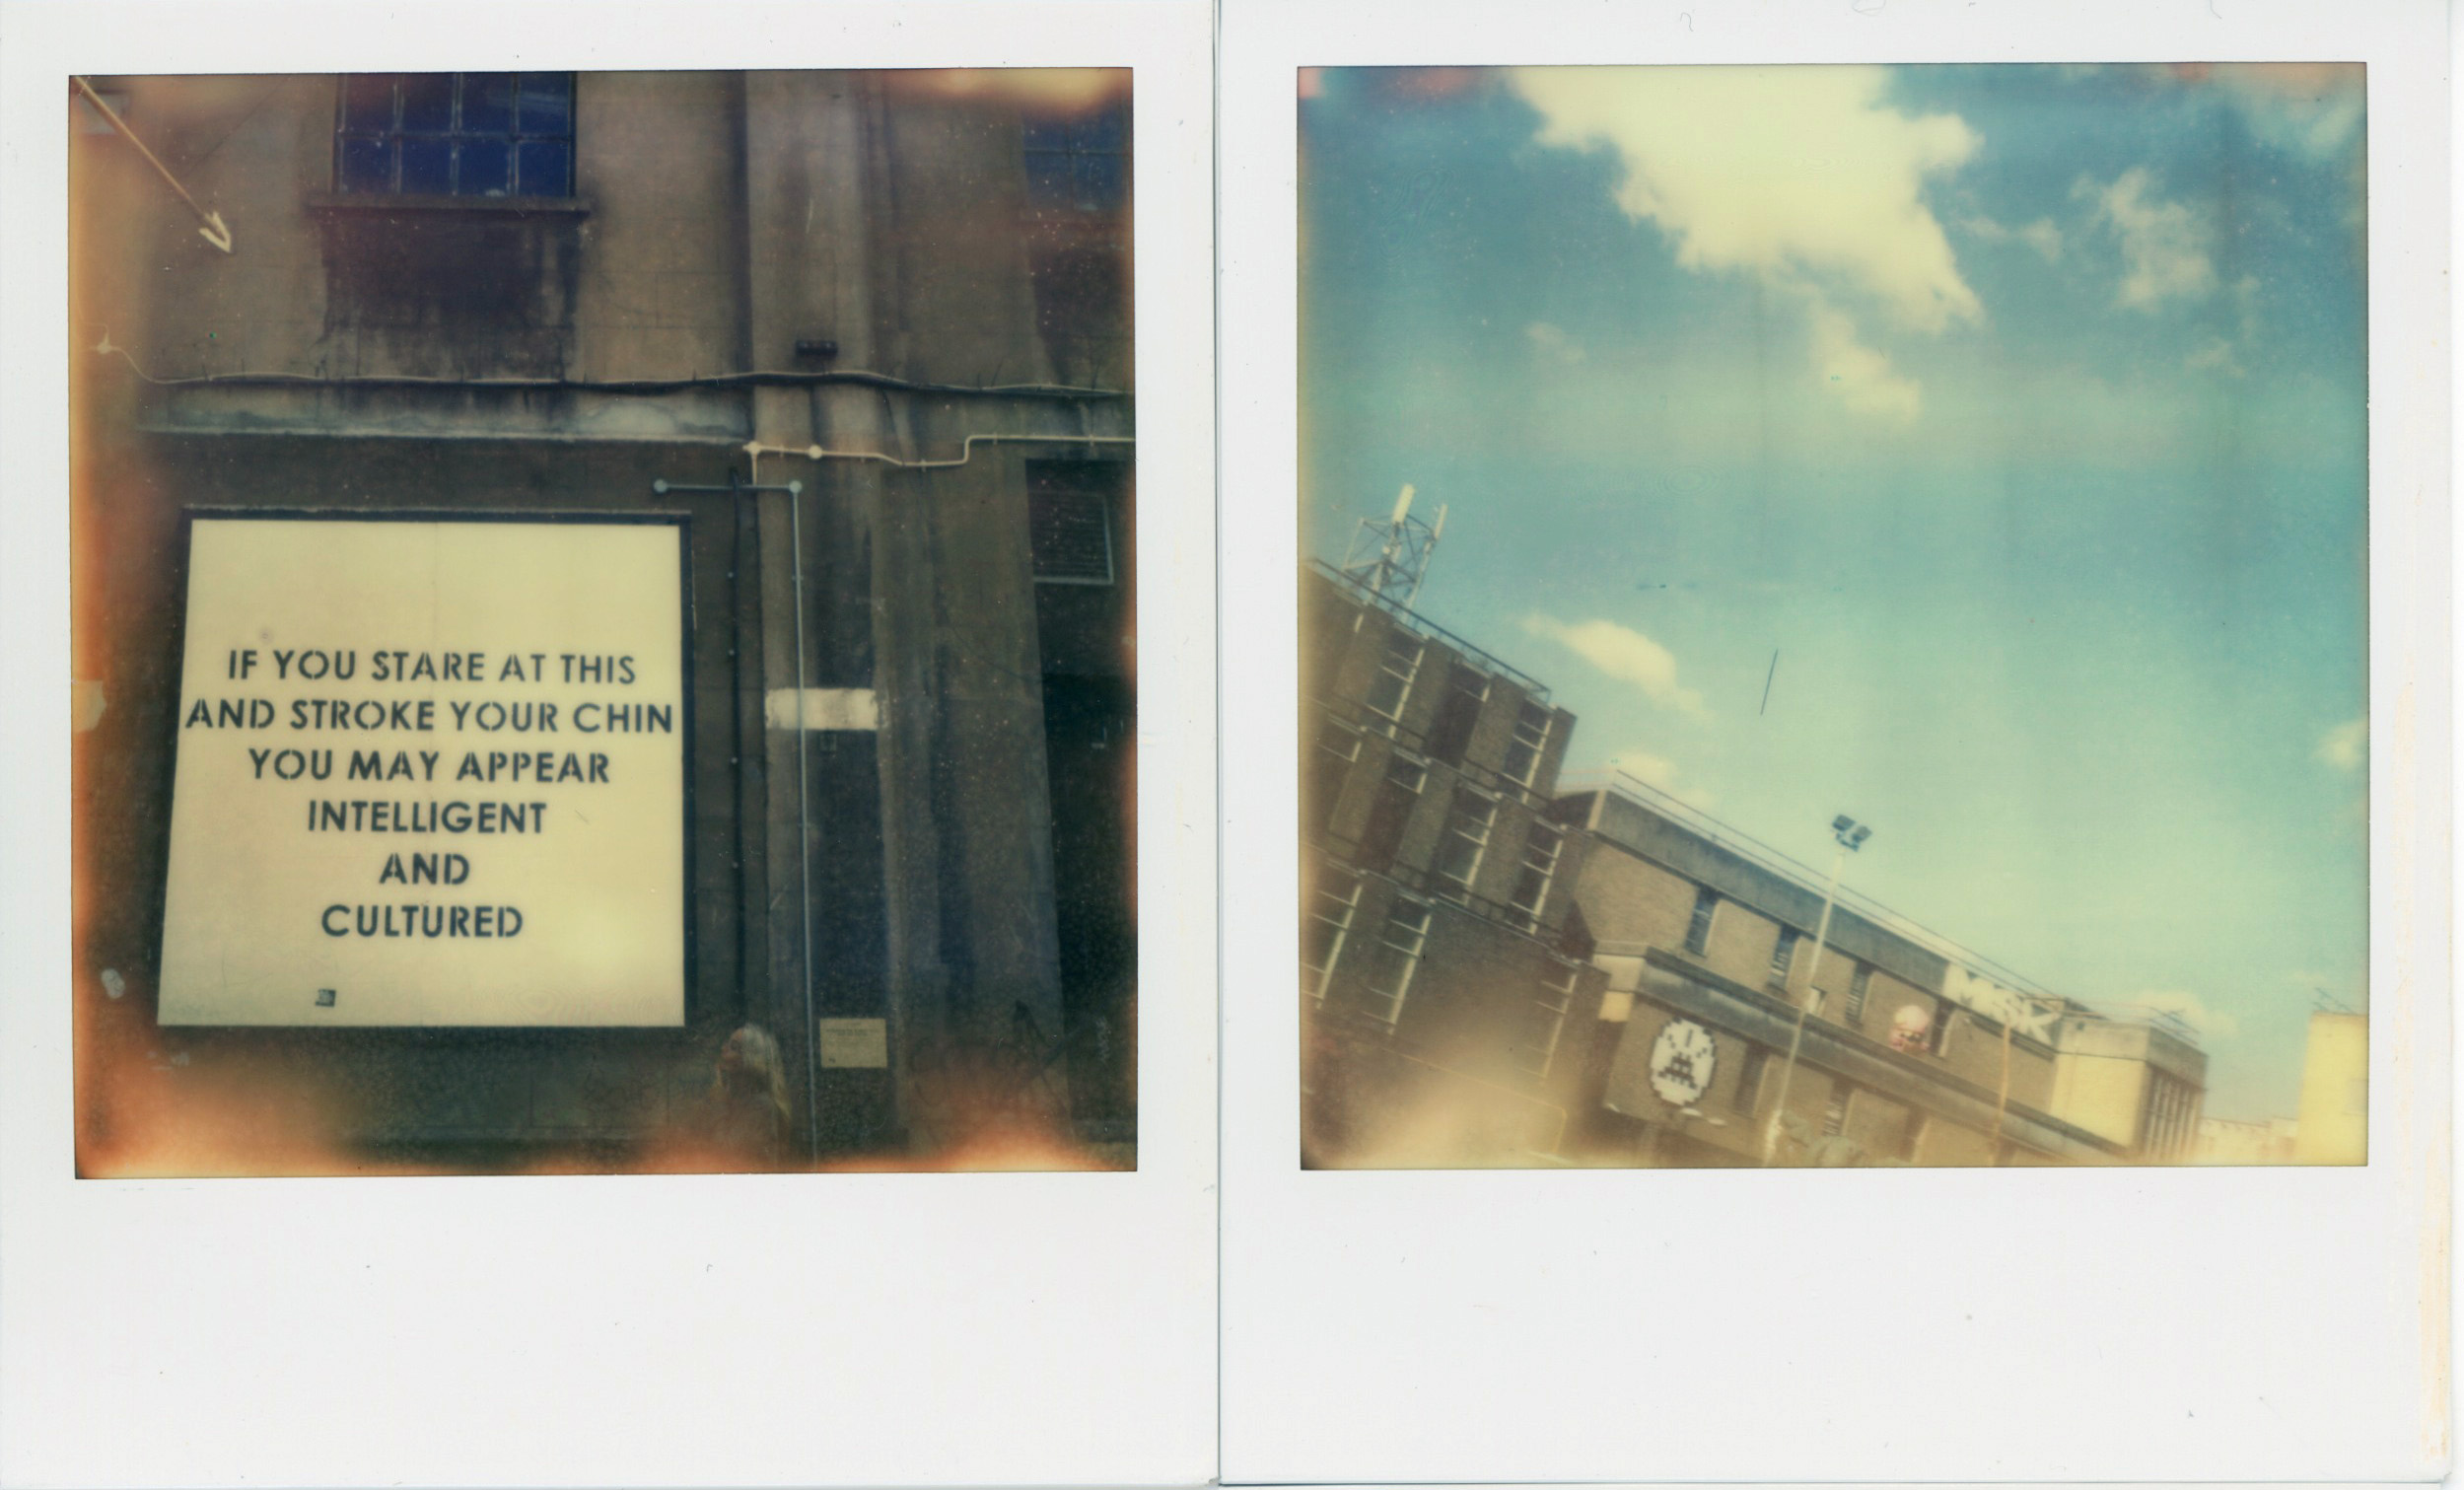 Polaroid Frame App - Page 6 - Frame Design & Reviews ✓